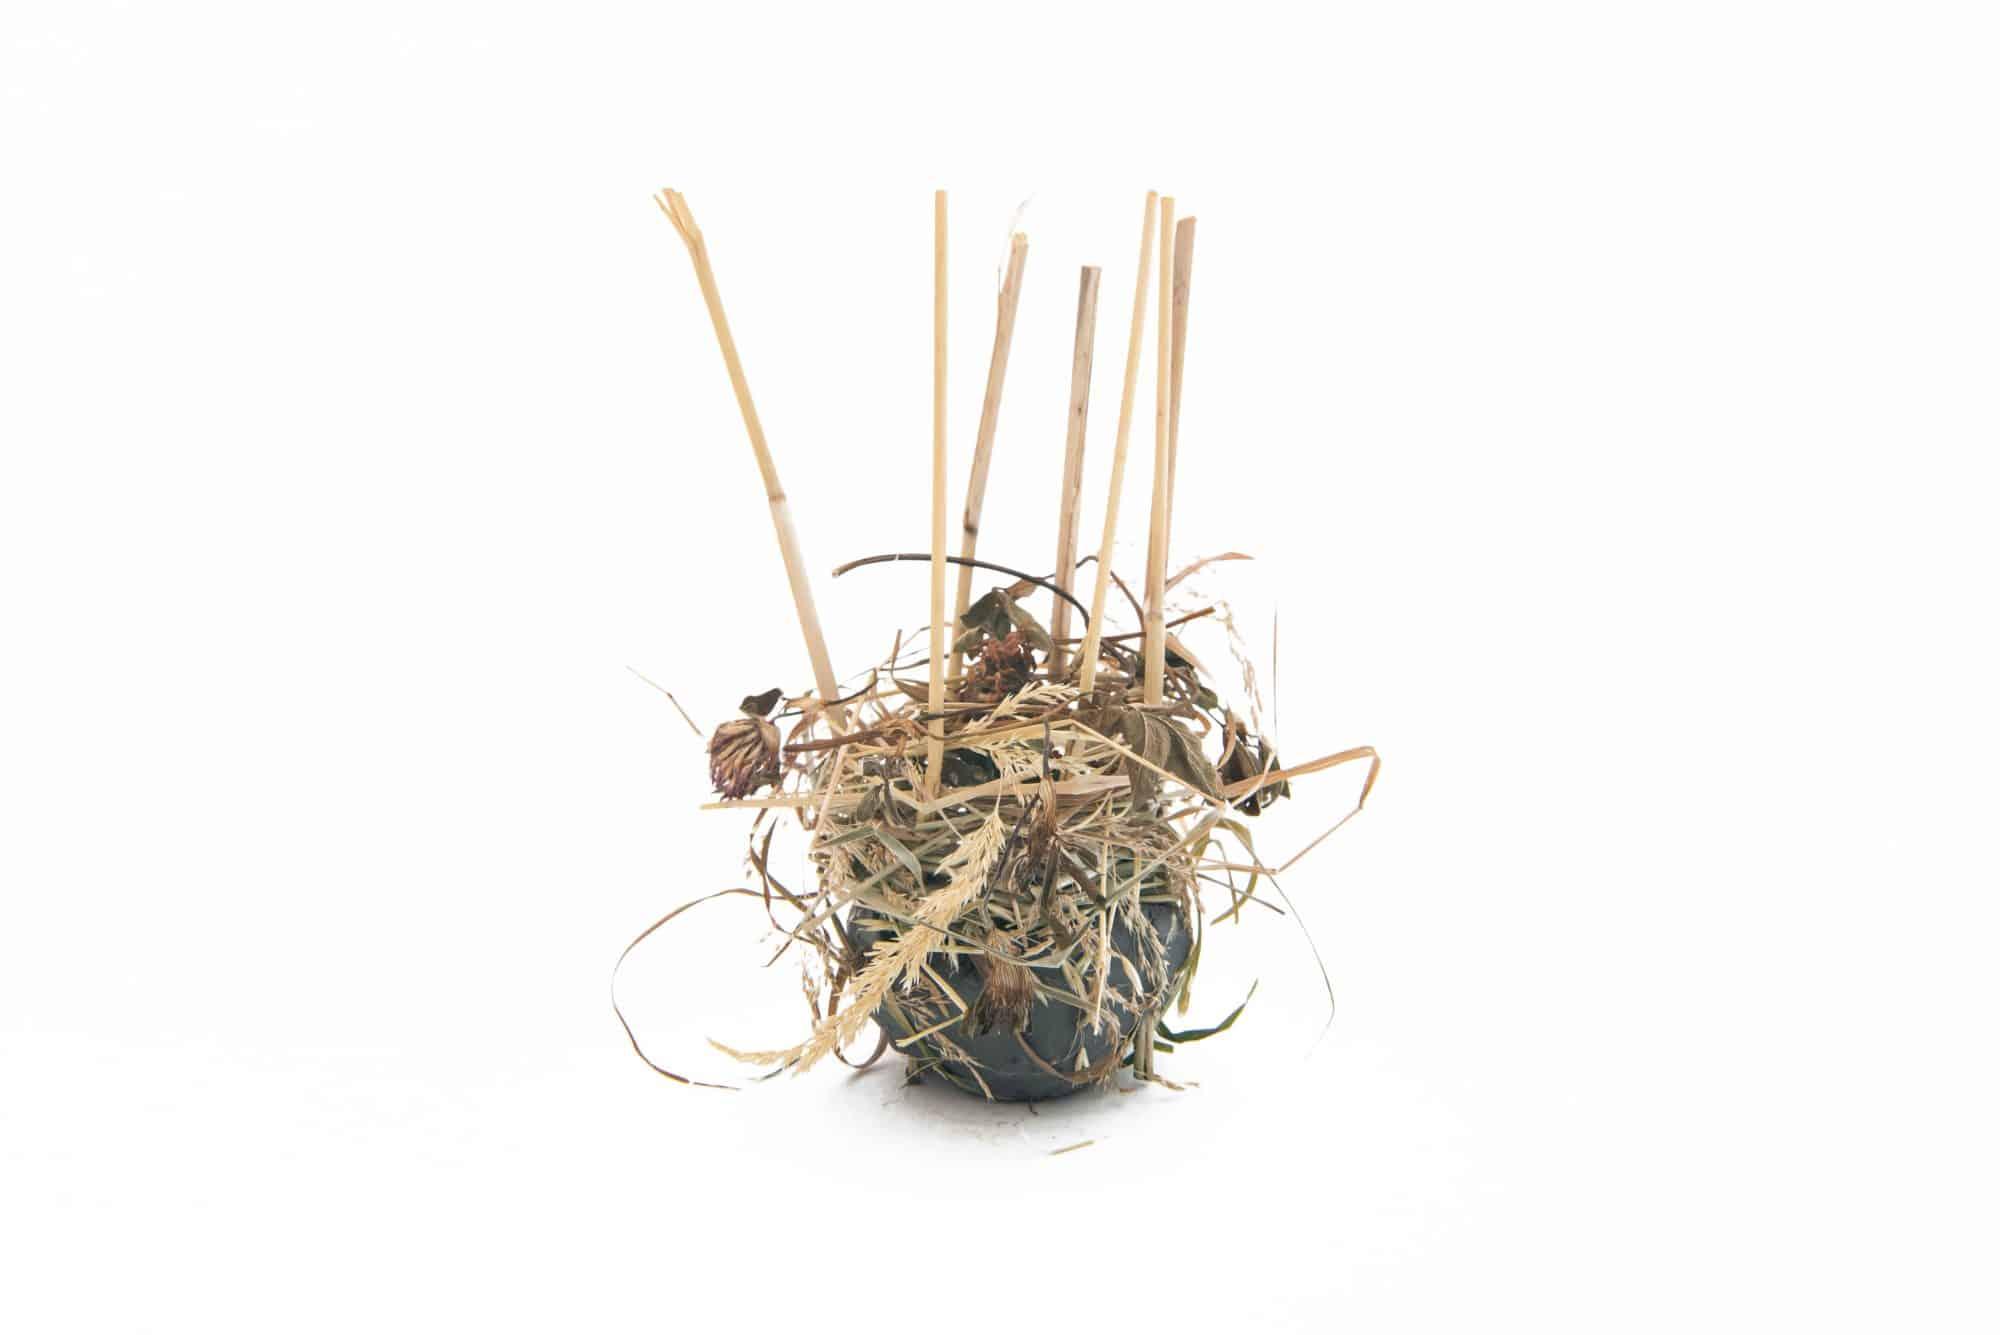 Shrill Carder Bee Nest